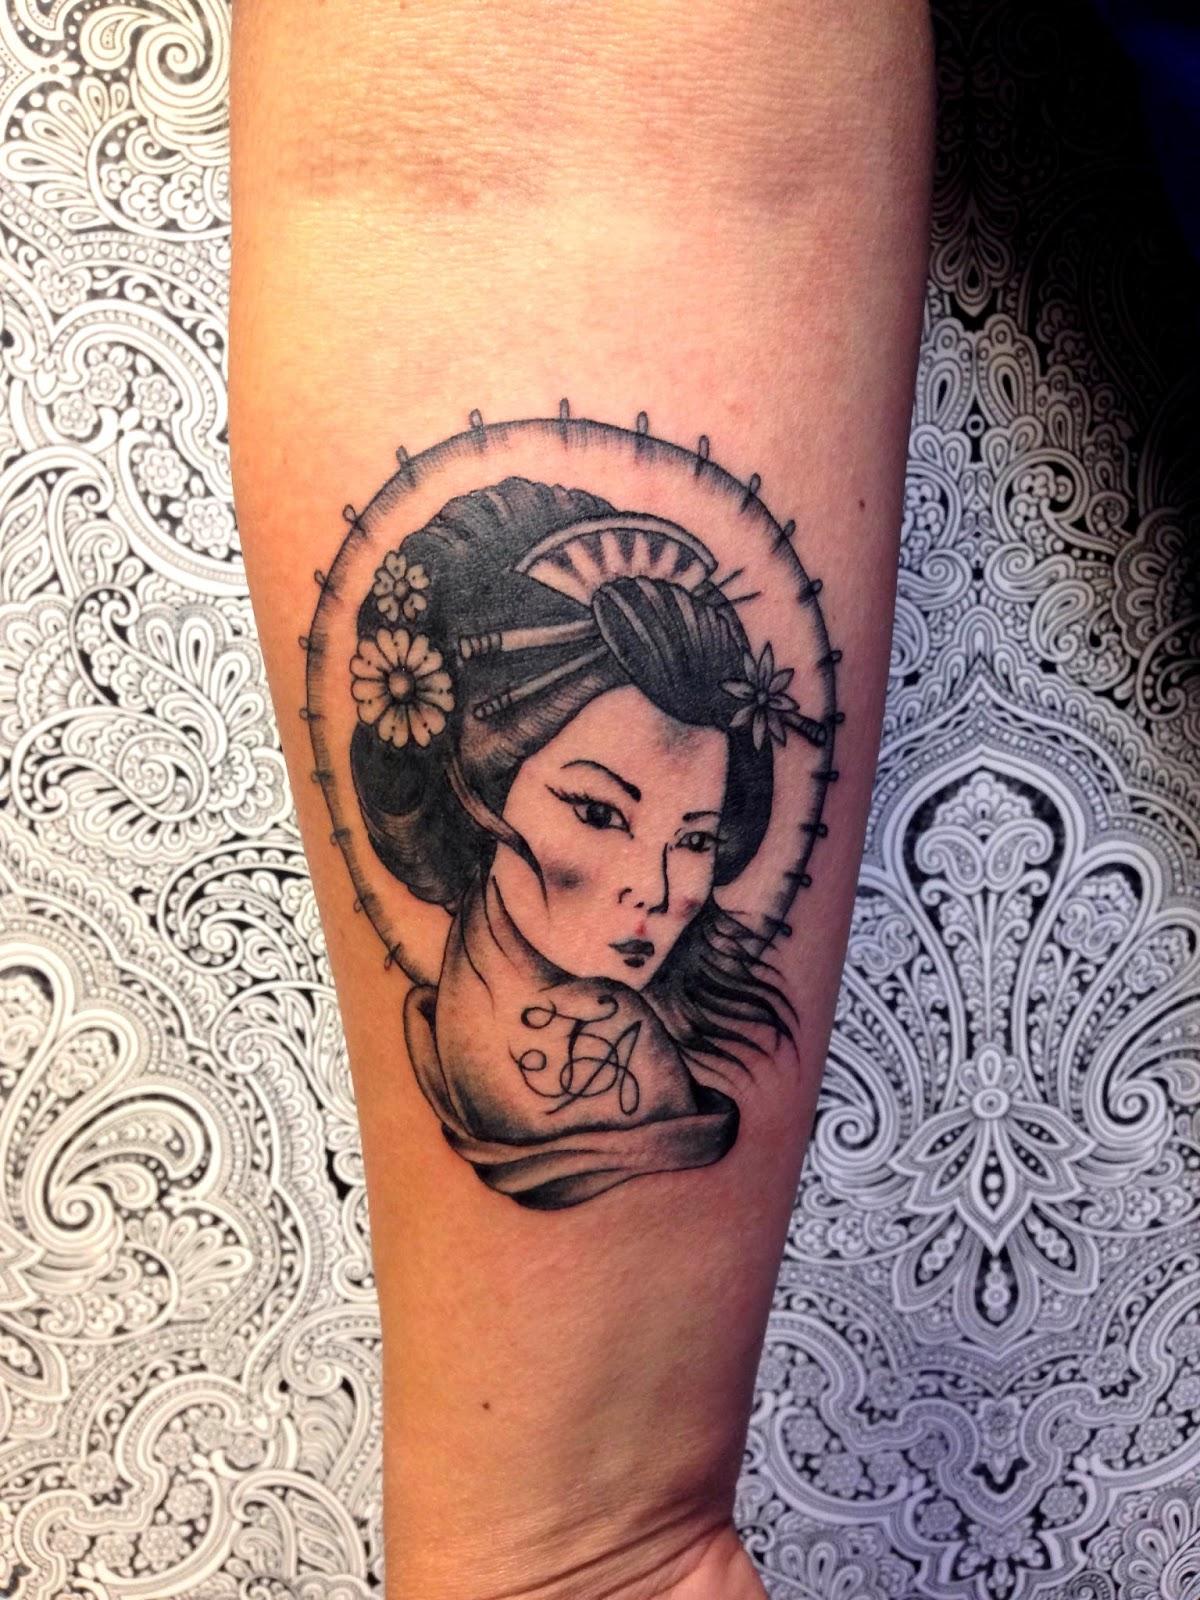 Tatuaggeria da margot liv geisha significato e for Disegni tradizionali giapponesi